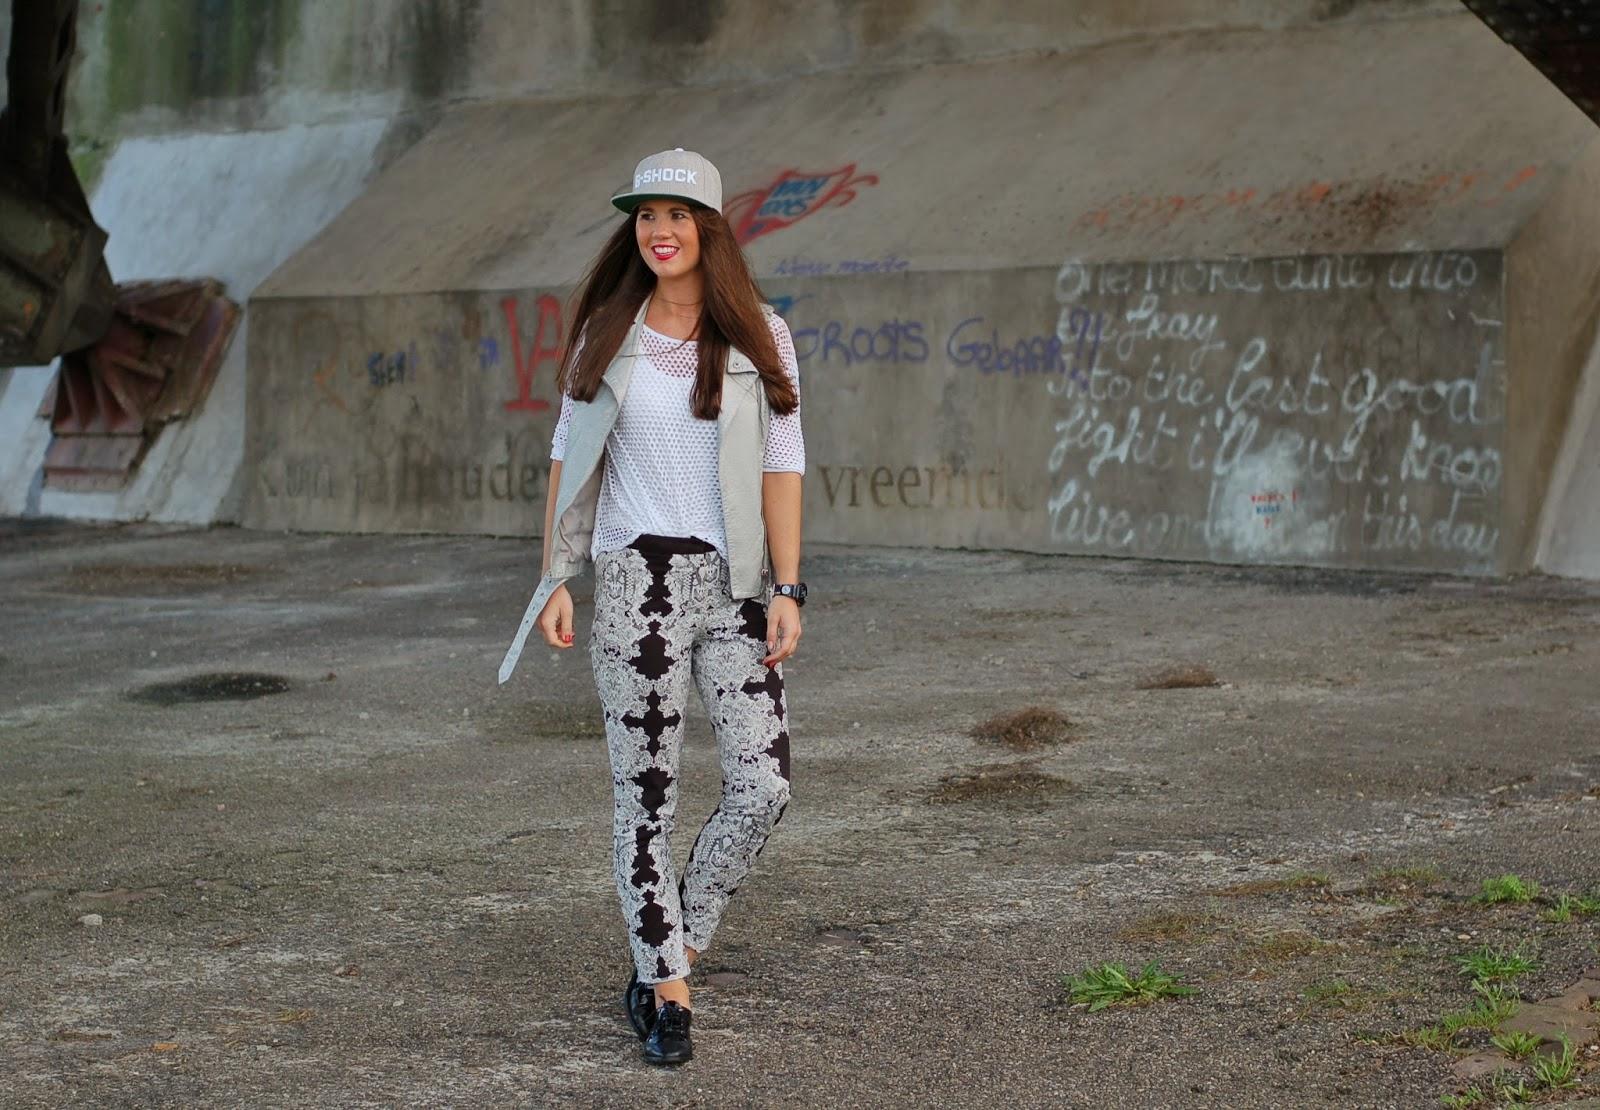 fashionista chloe fashionblogger 2013